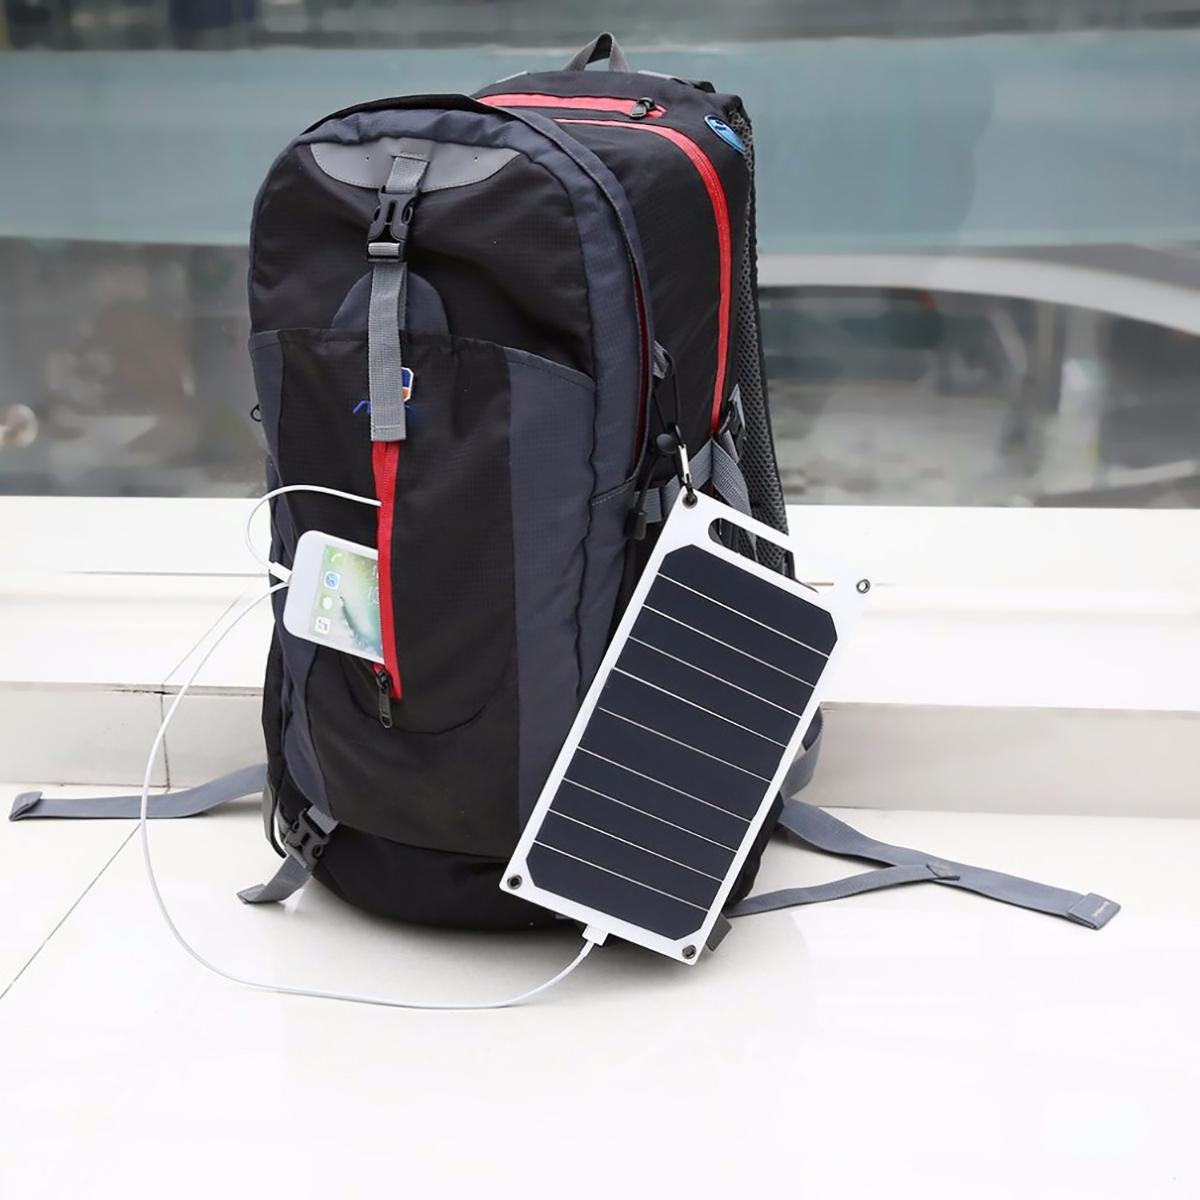 Solar Panel 5 Volt 10 Watt USB Charger